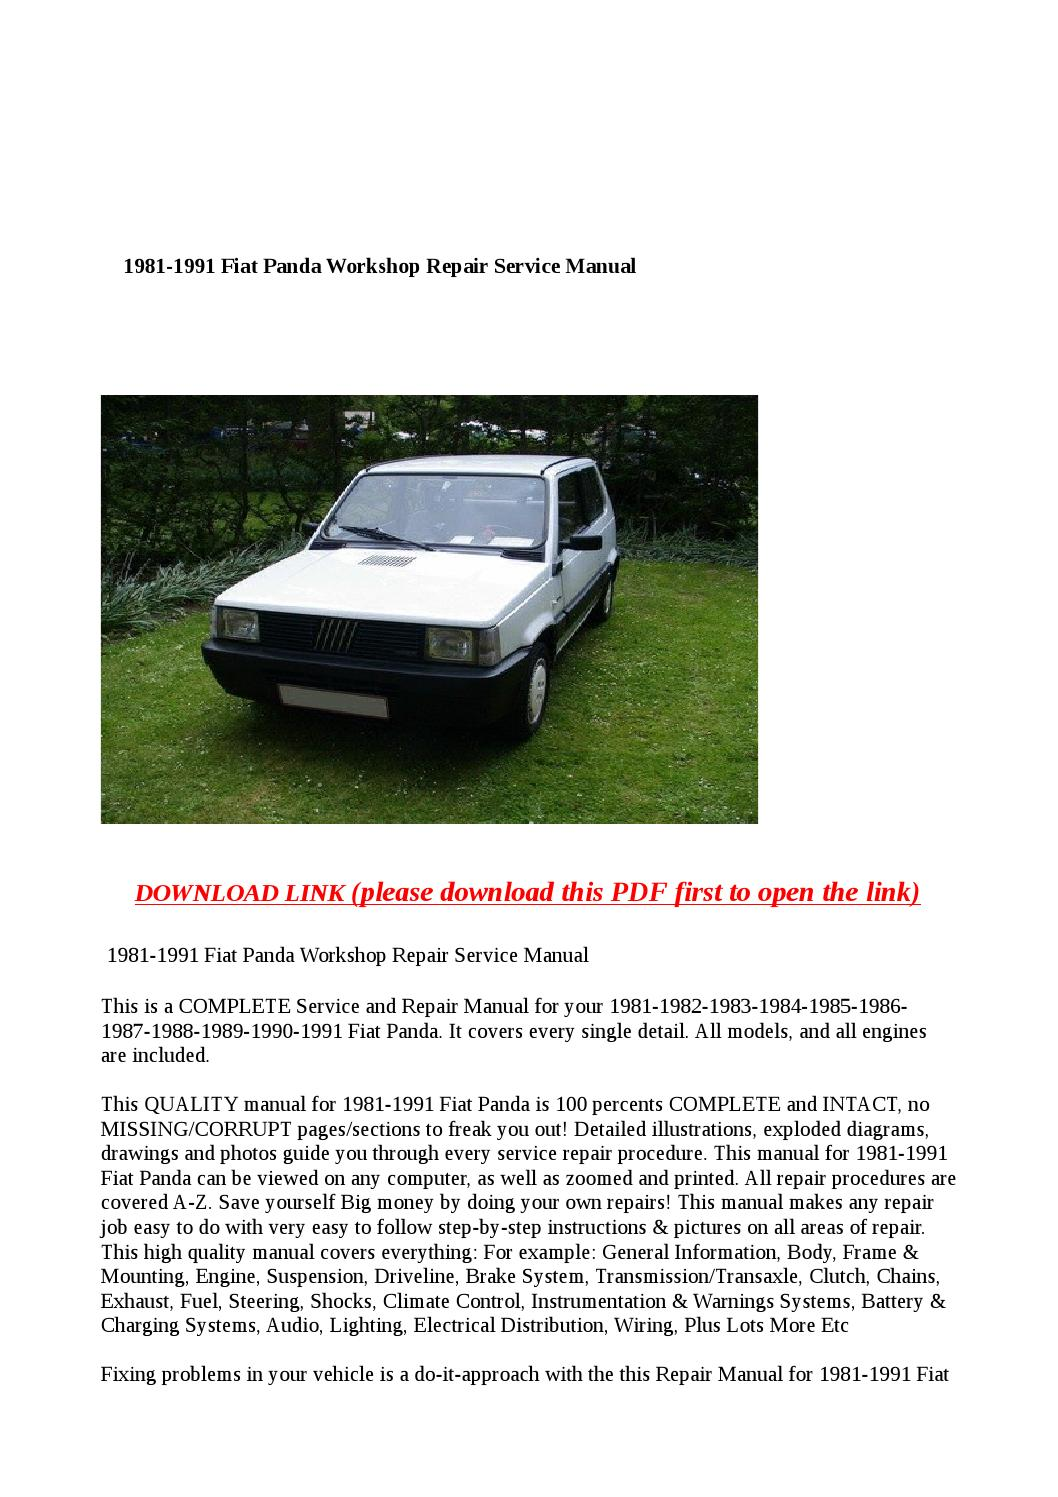 1981 1991 fiat panda workshop repair service manual by. Black Bedroom Furniture Sets. Home Design Ideas